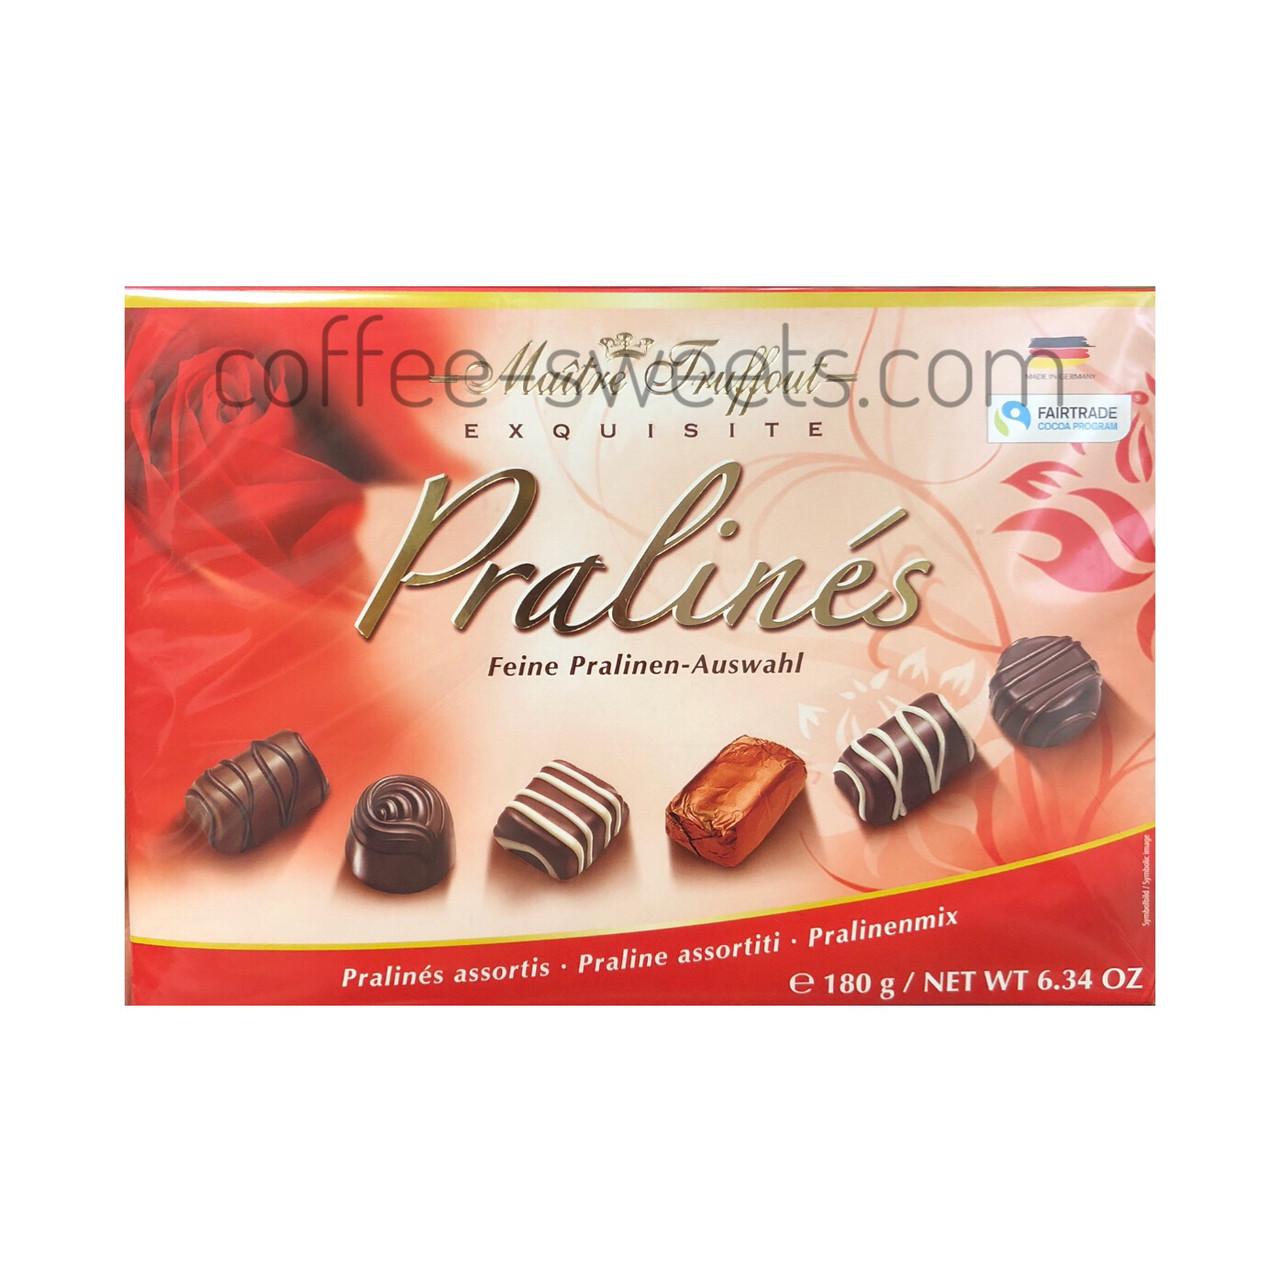 Конфеты Maitre Truffout Exquisite Pralines (красная) 180g